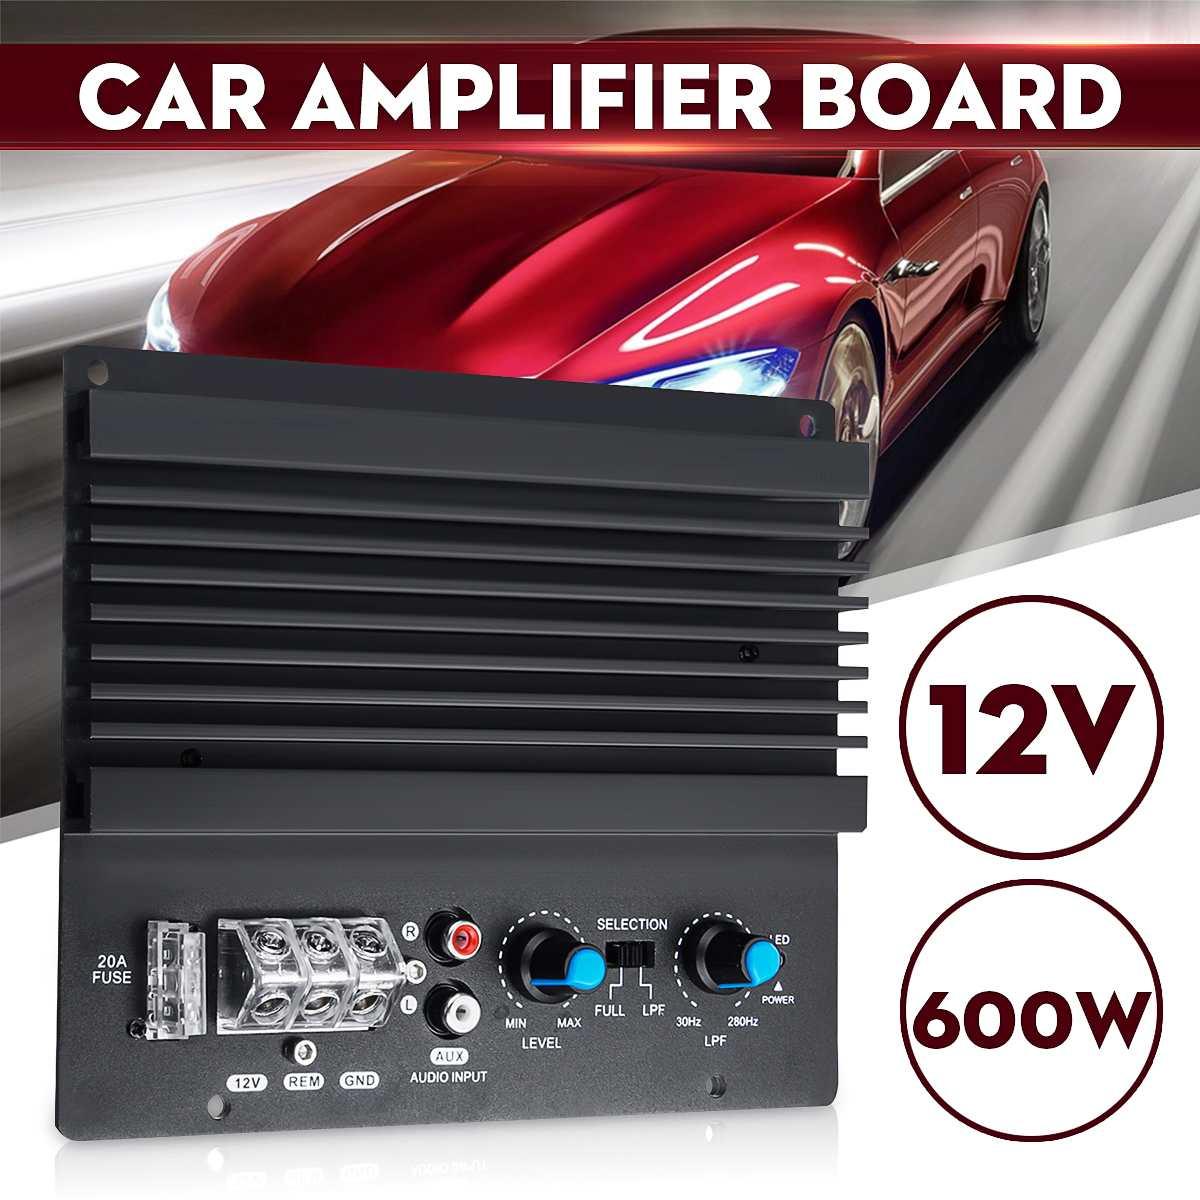 12v 600w Mono Car Audio Power Amplifier Powerful Bass Subwoofers Amp Car Amplifier Board Car Speaker Aux Subwoofer Amplifiers